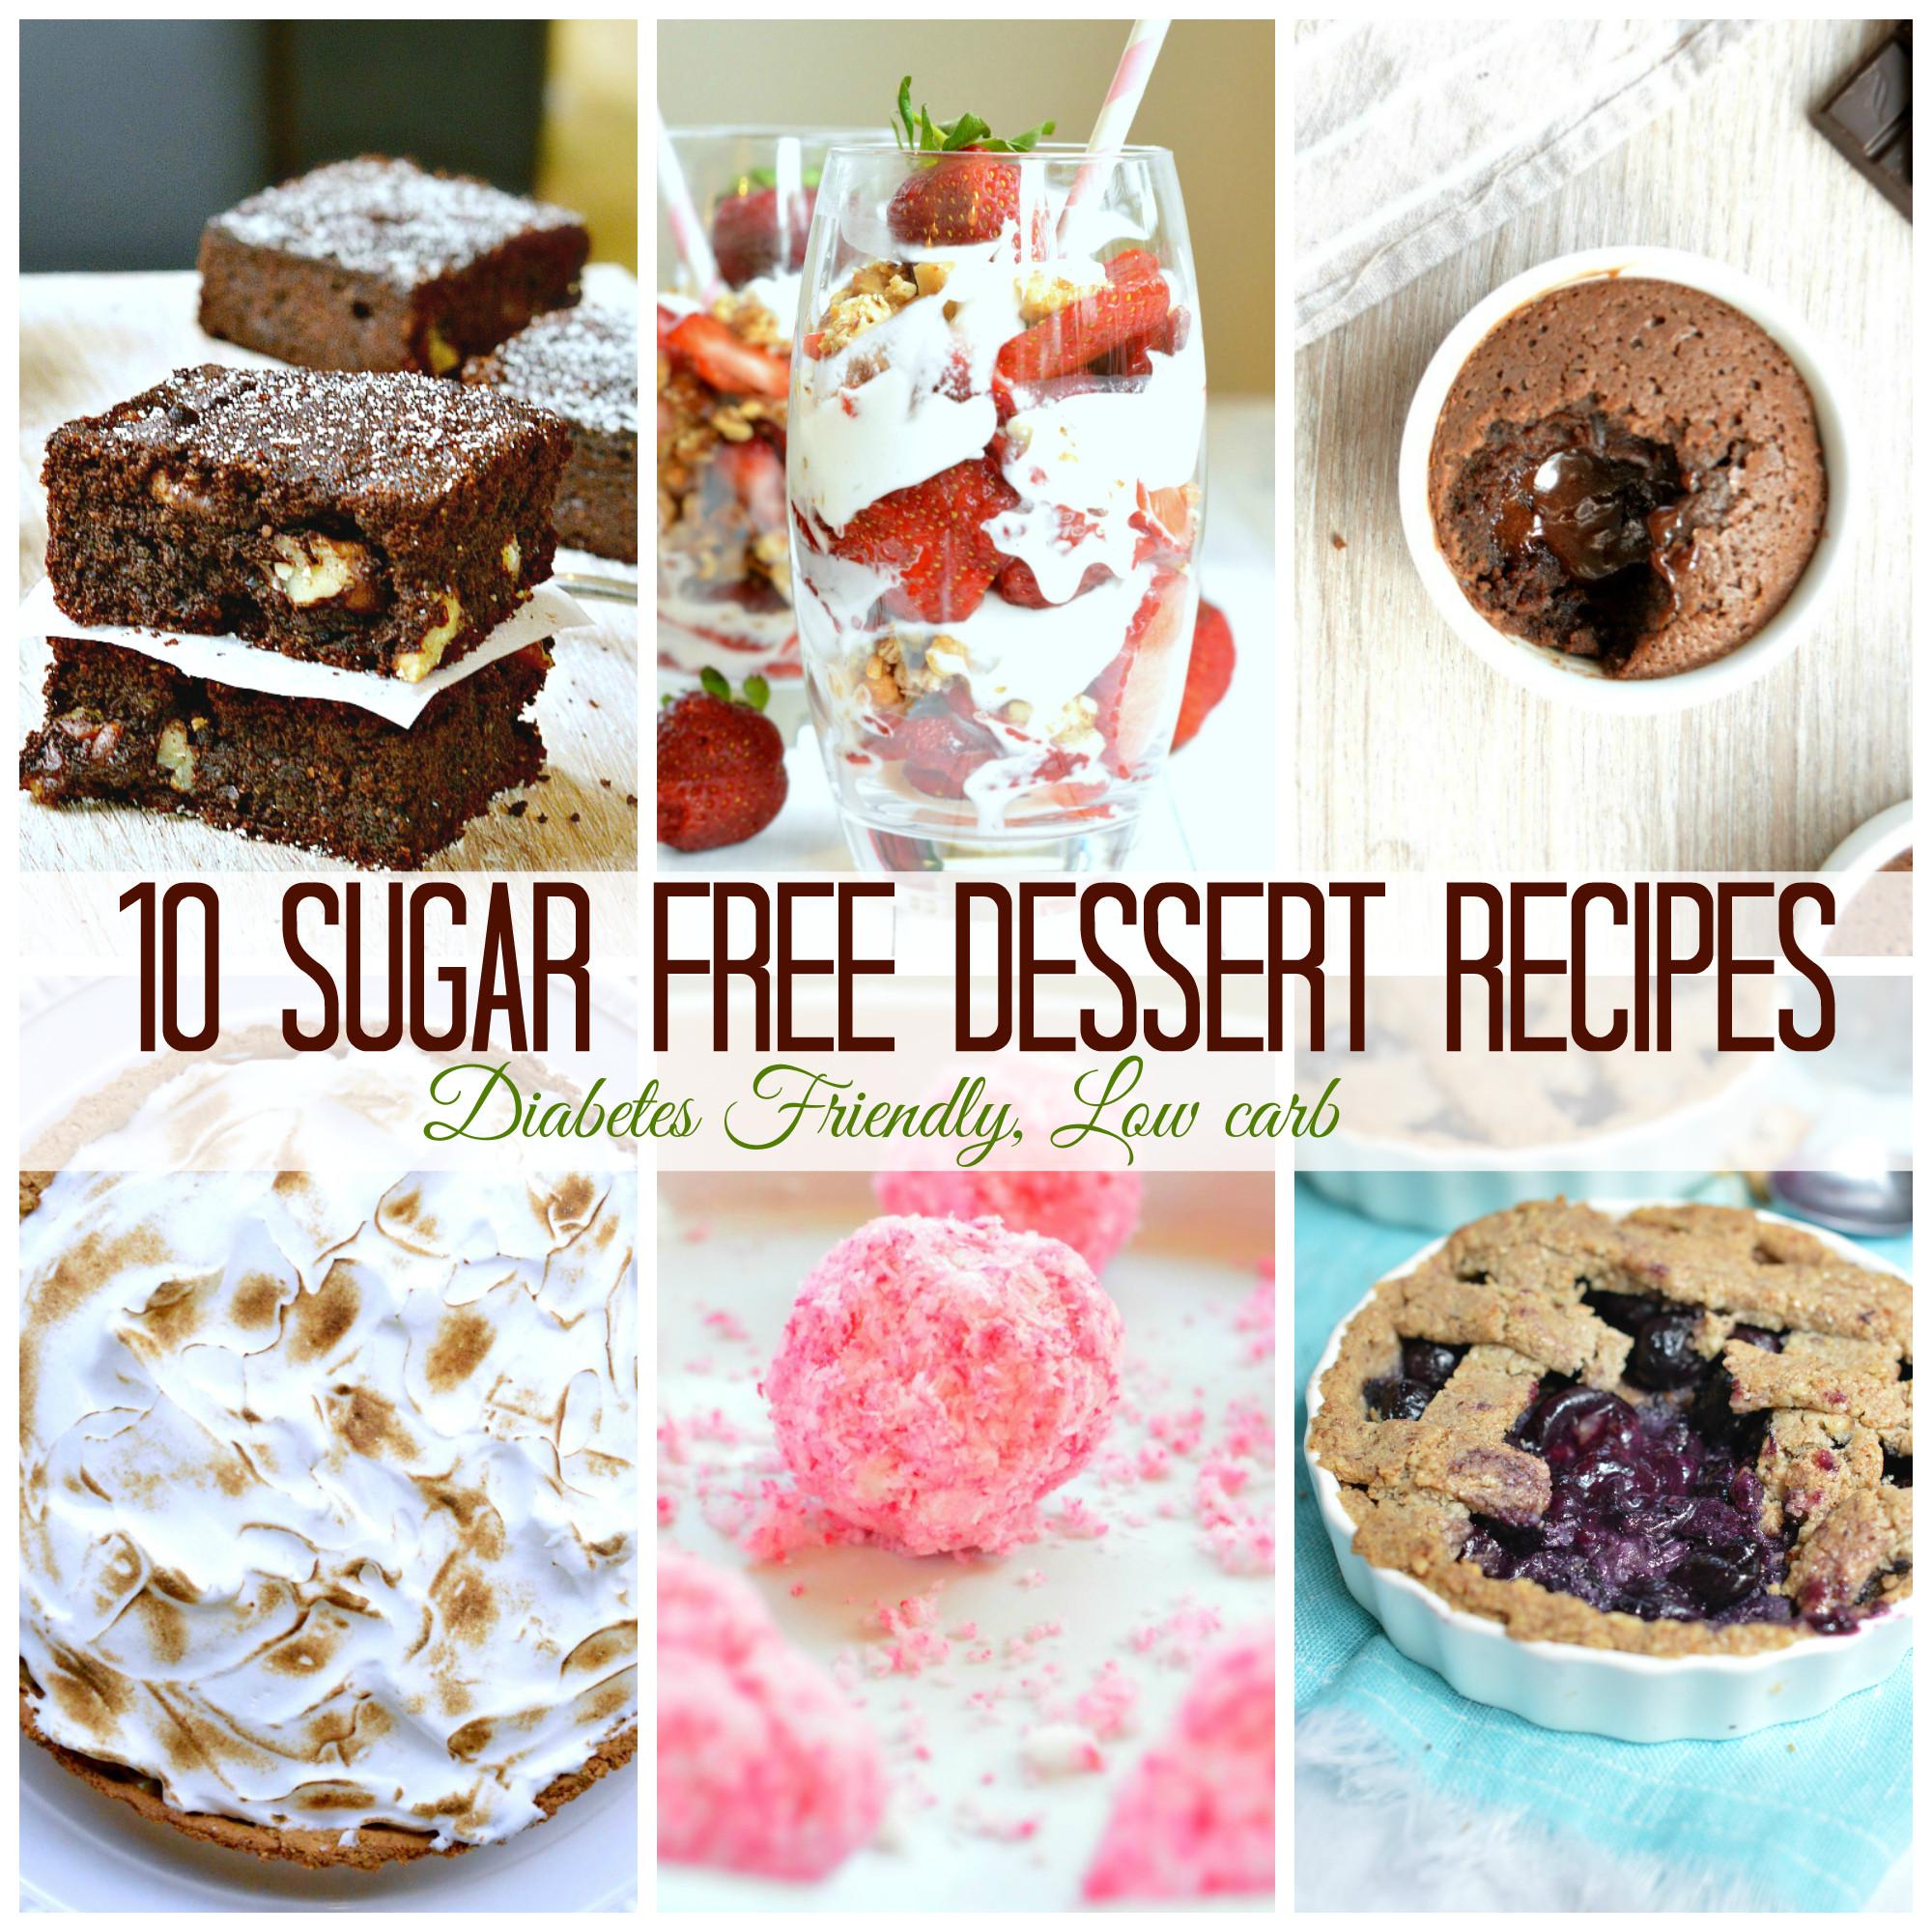 Sugar Free Desserts Recipes For Diabetics  10 Sugar Free Dessert for diabetics SWEETASHONEY